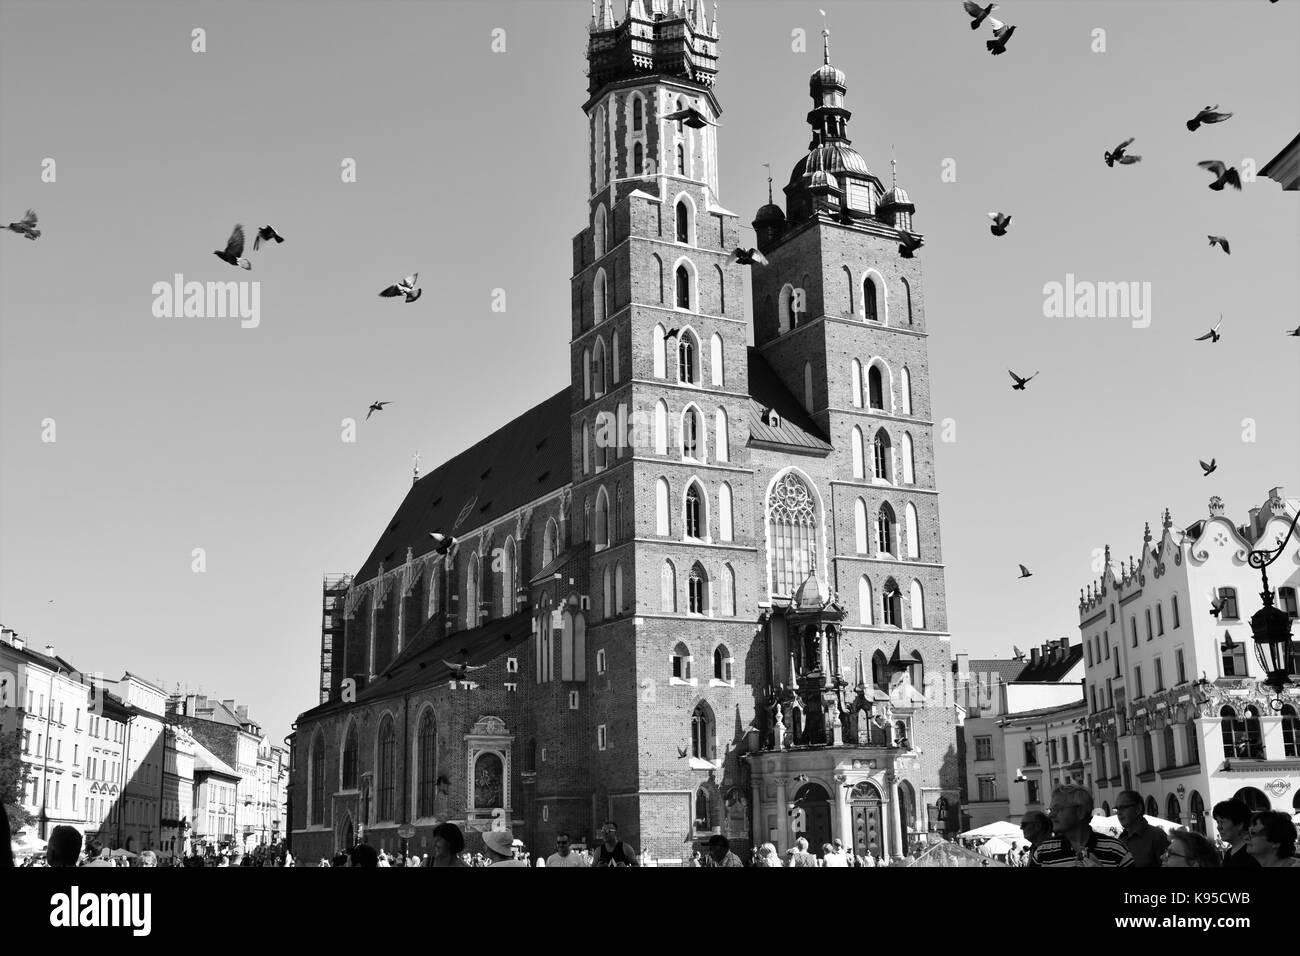 Krakow - Stock Image